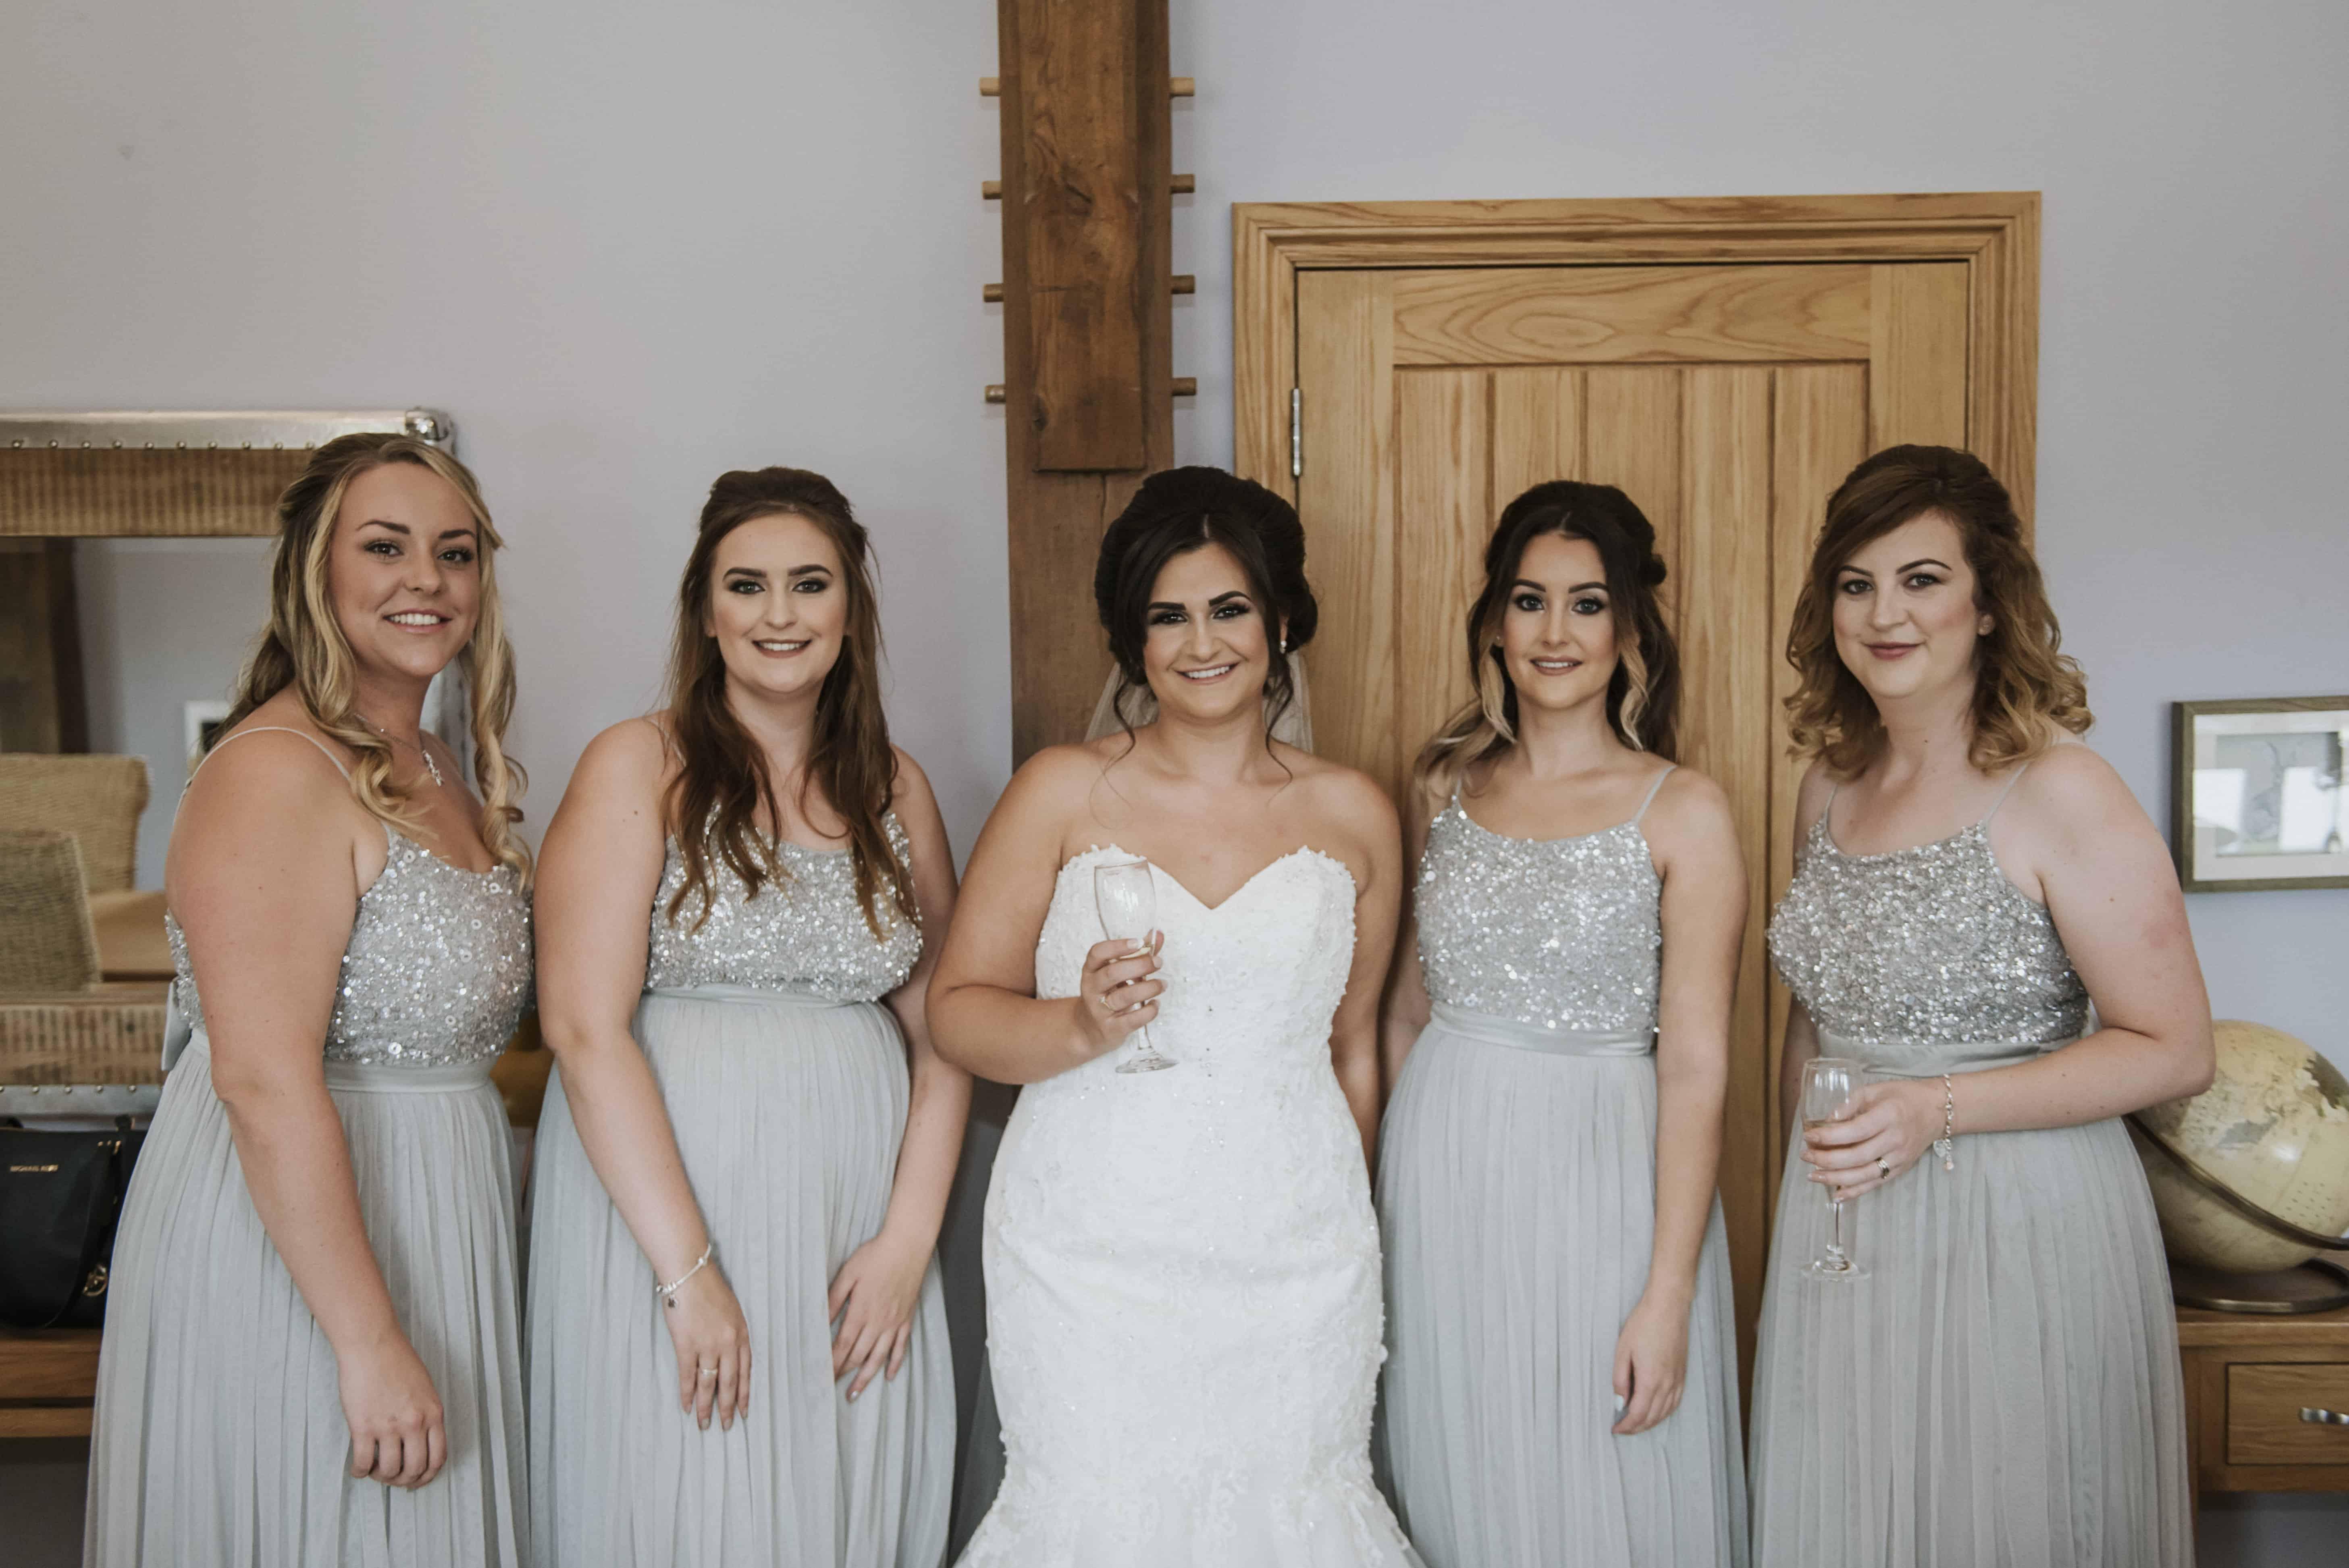 Bride 7 bridesmaids stood smiling Oldwalls Wedding Photographer